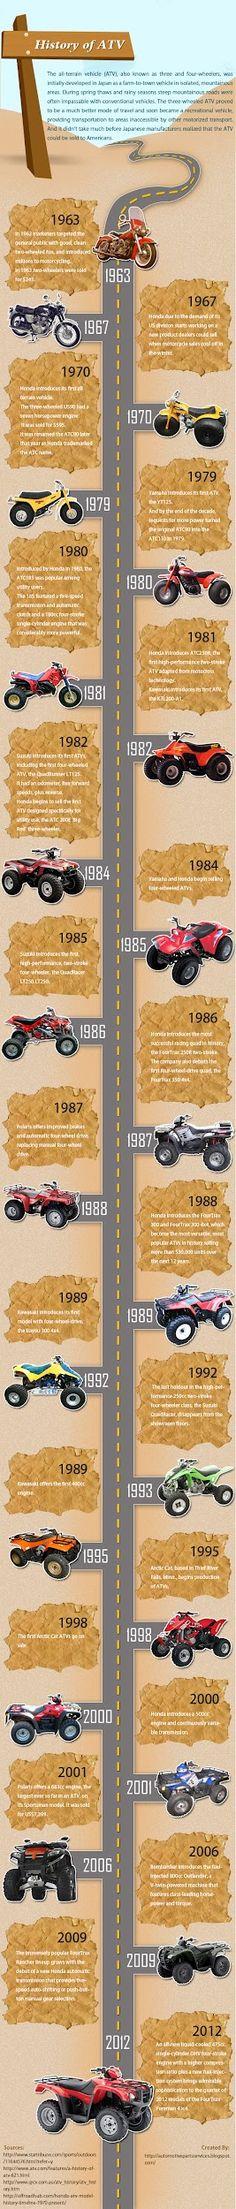 History of ATV